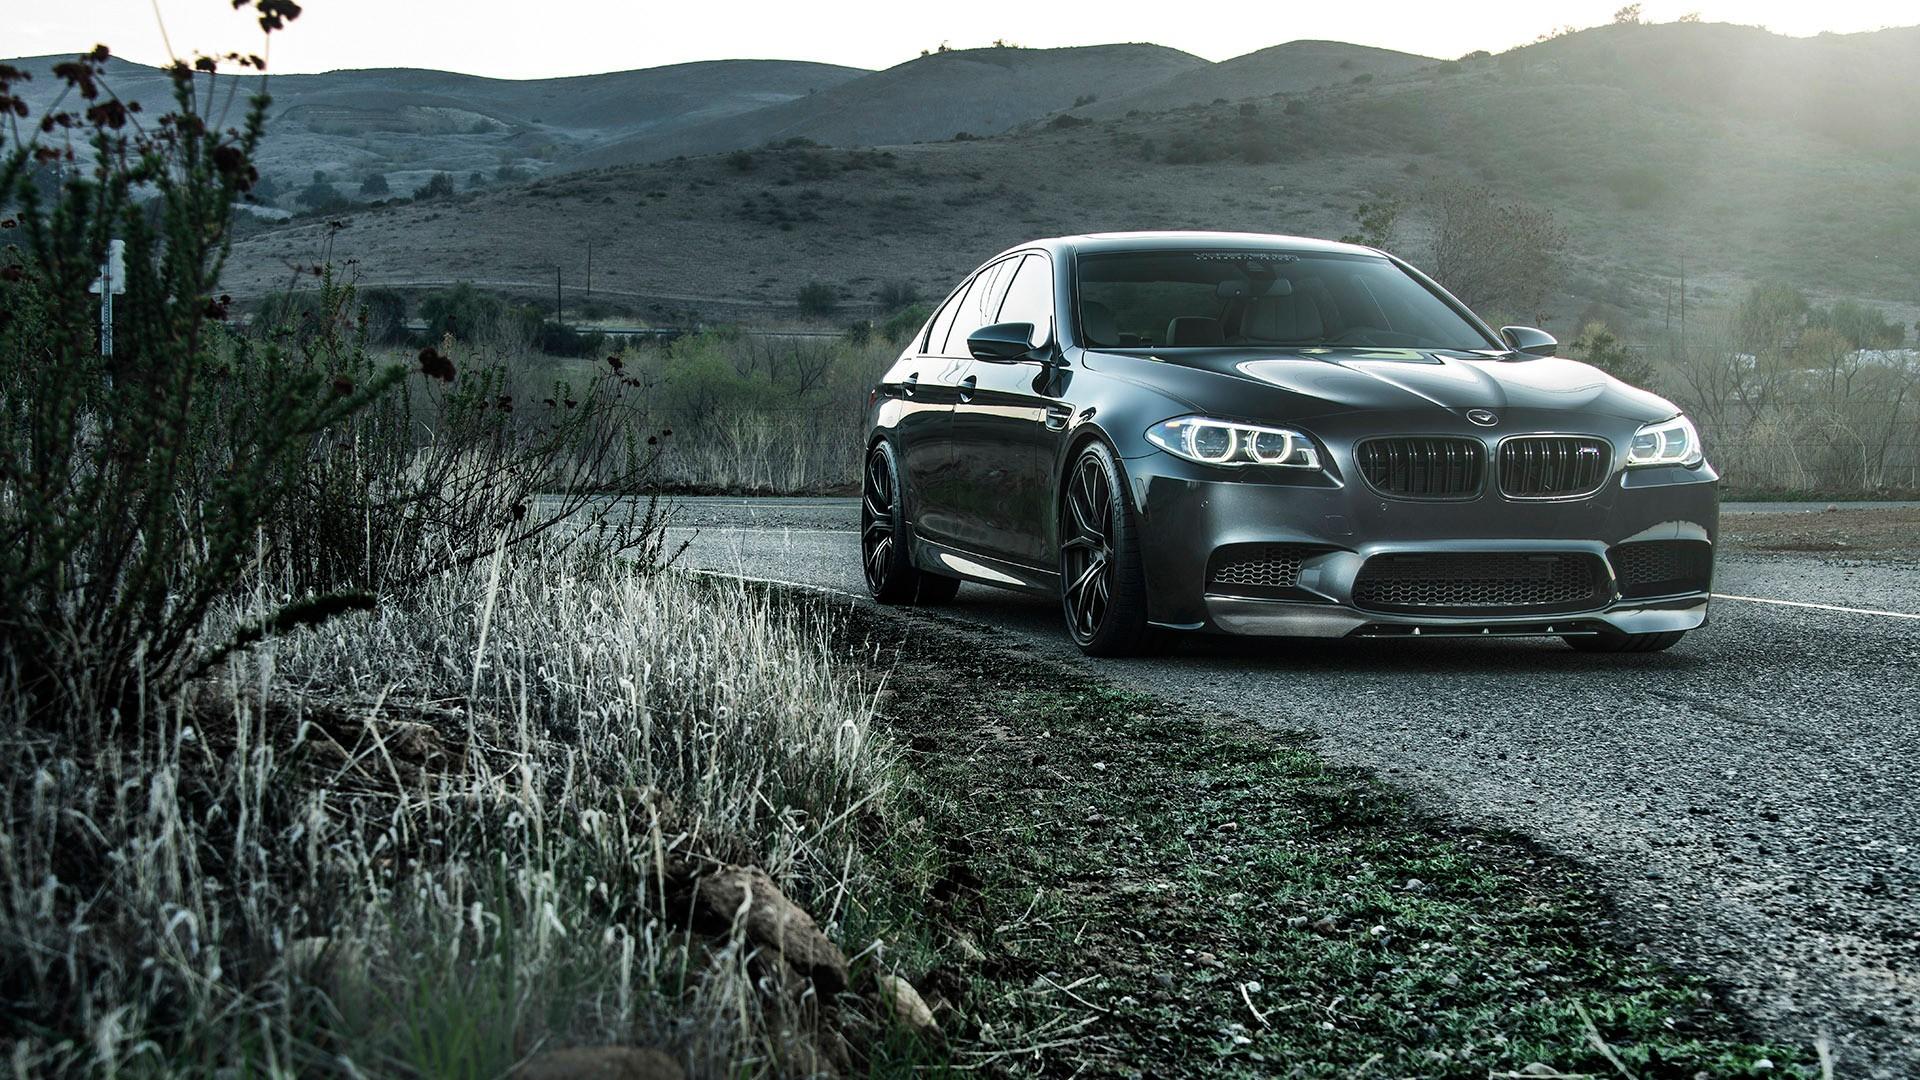 Vorsteiner BMW M5 VSE Wallpaper | HD Car Wallpapers | ID #4463